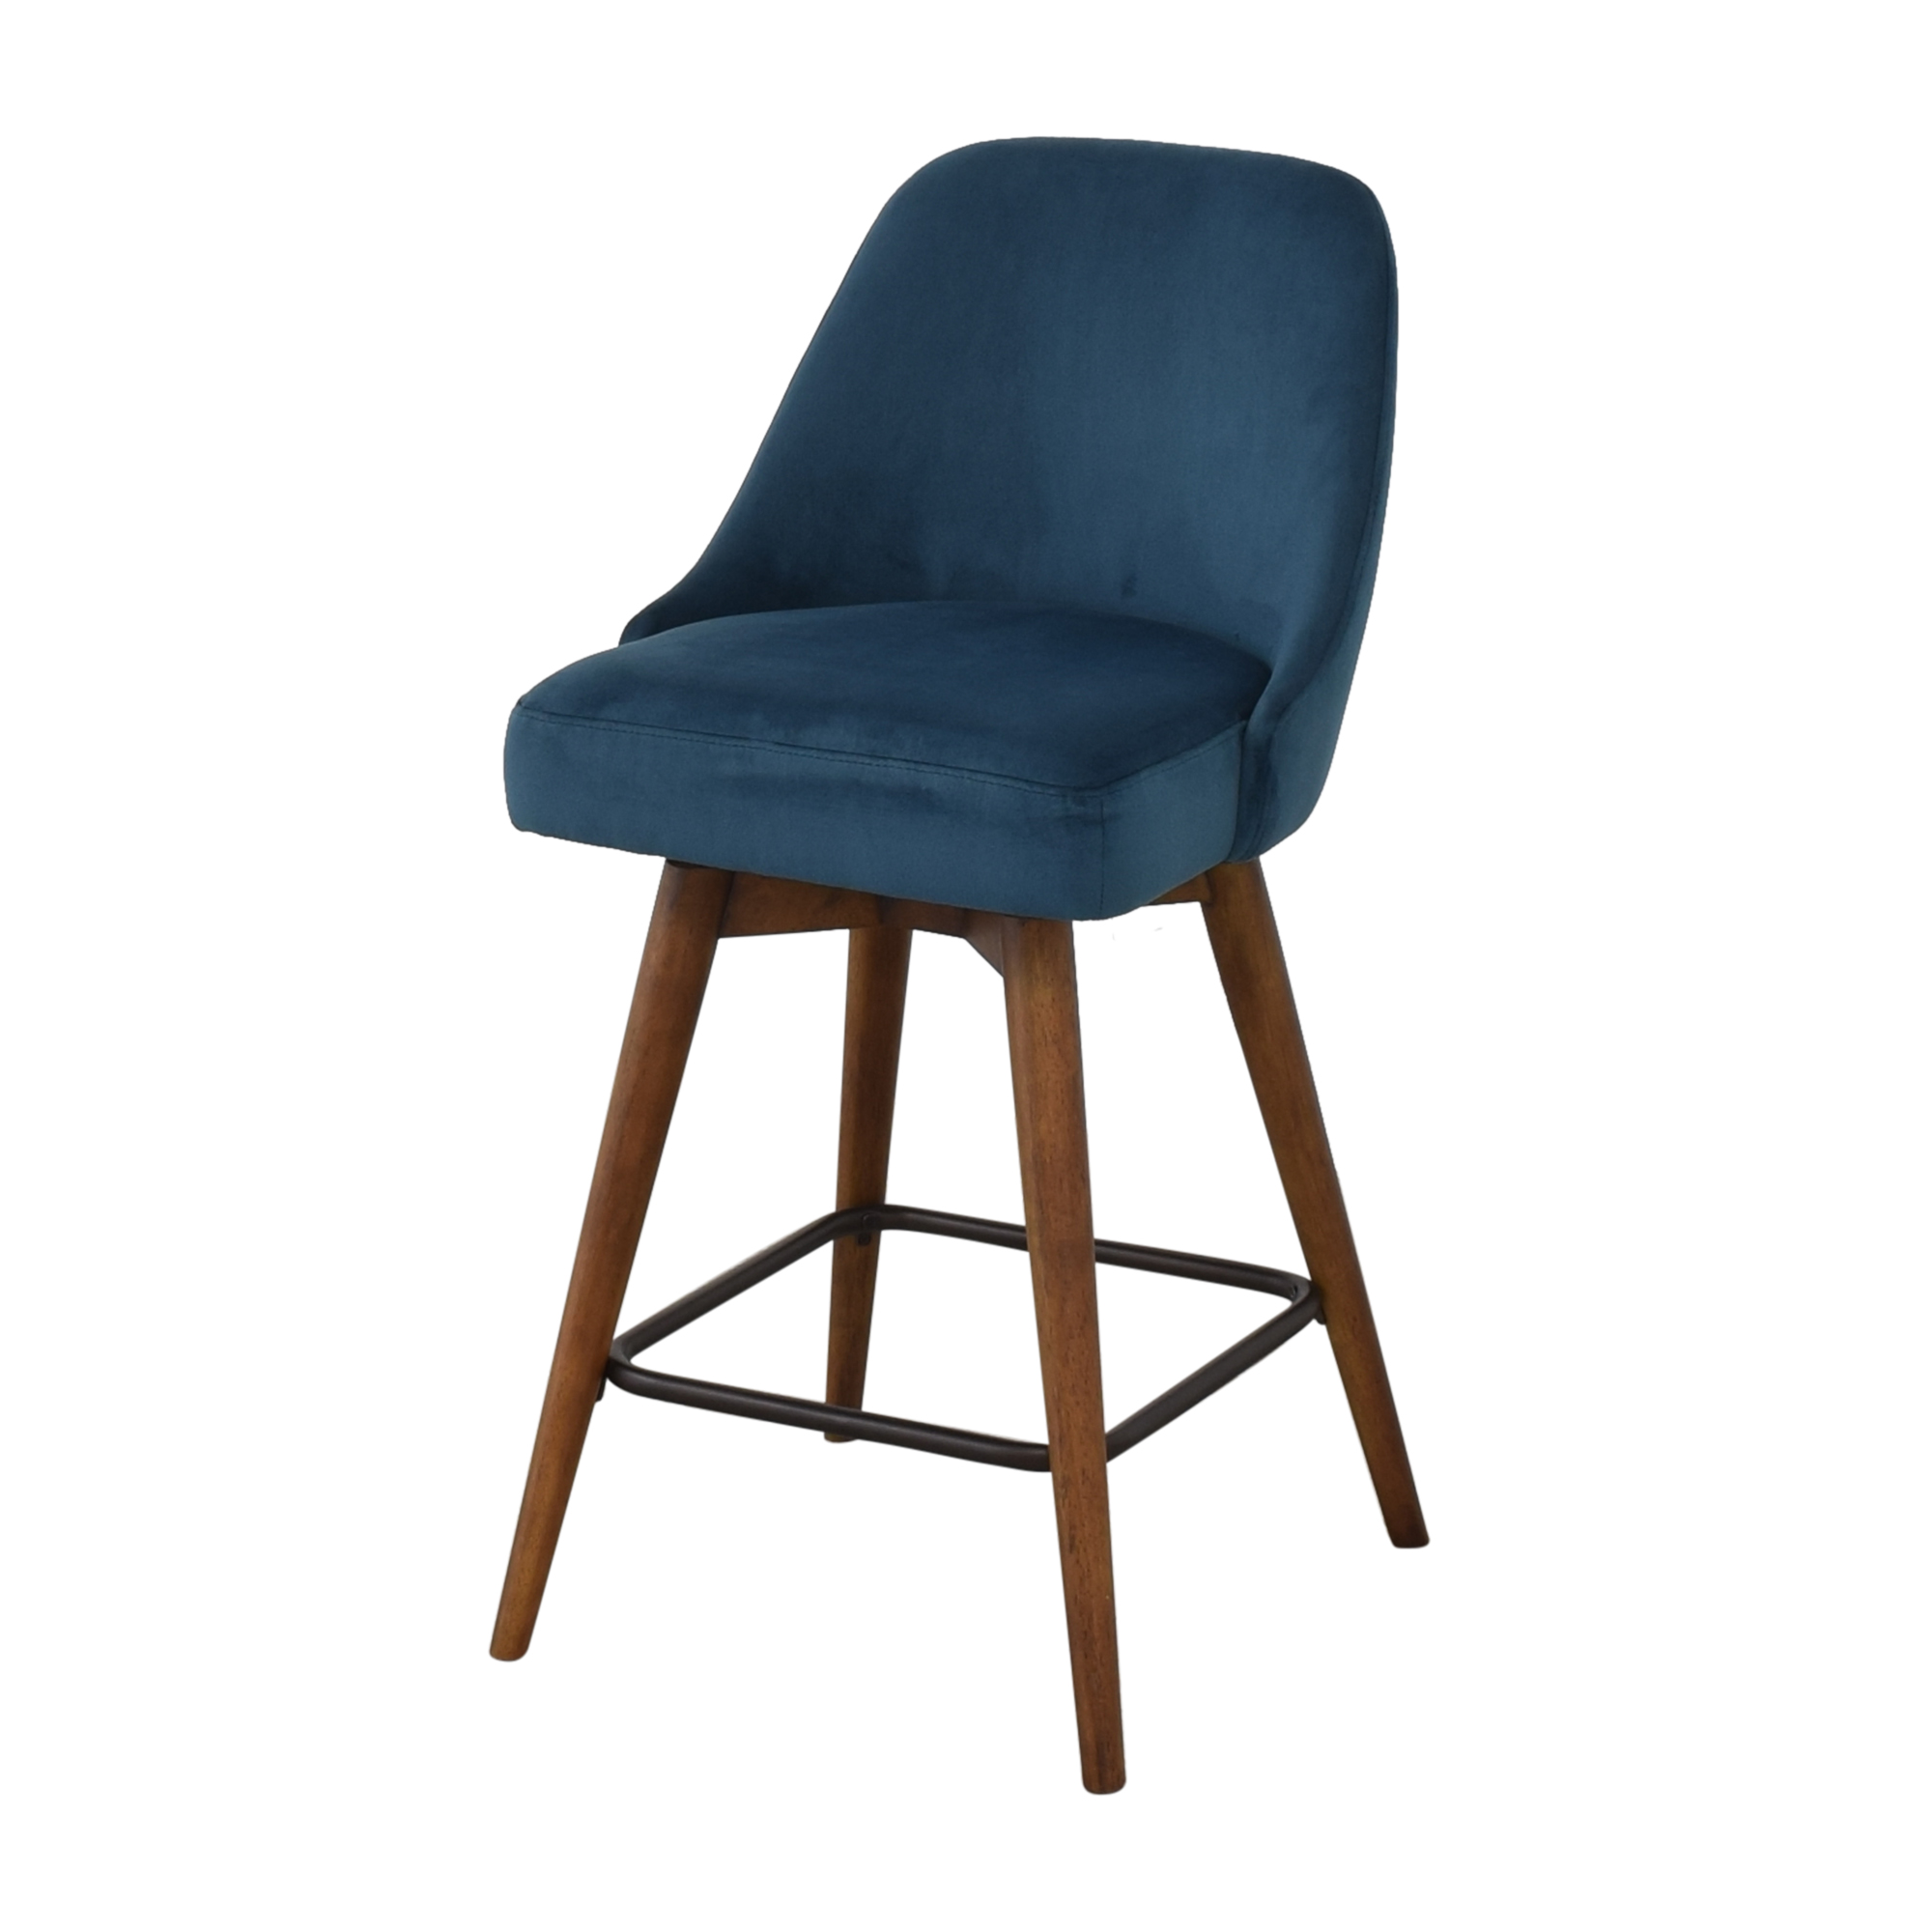 West Elm West Elm Mid-Century Upholstered Swivel Counter Stool used